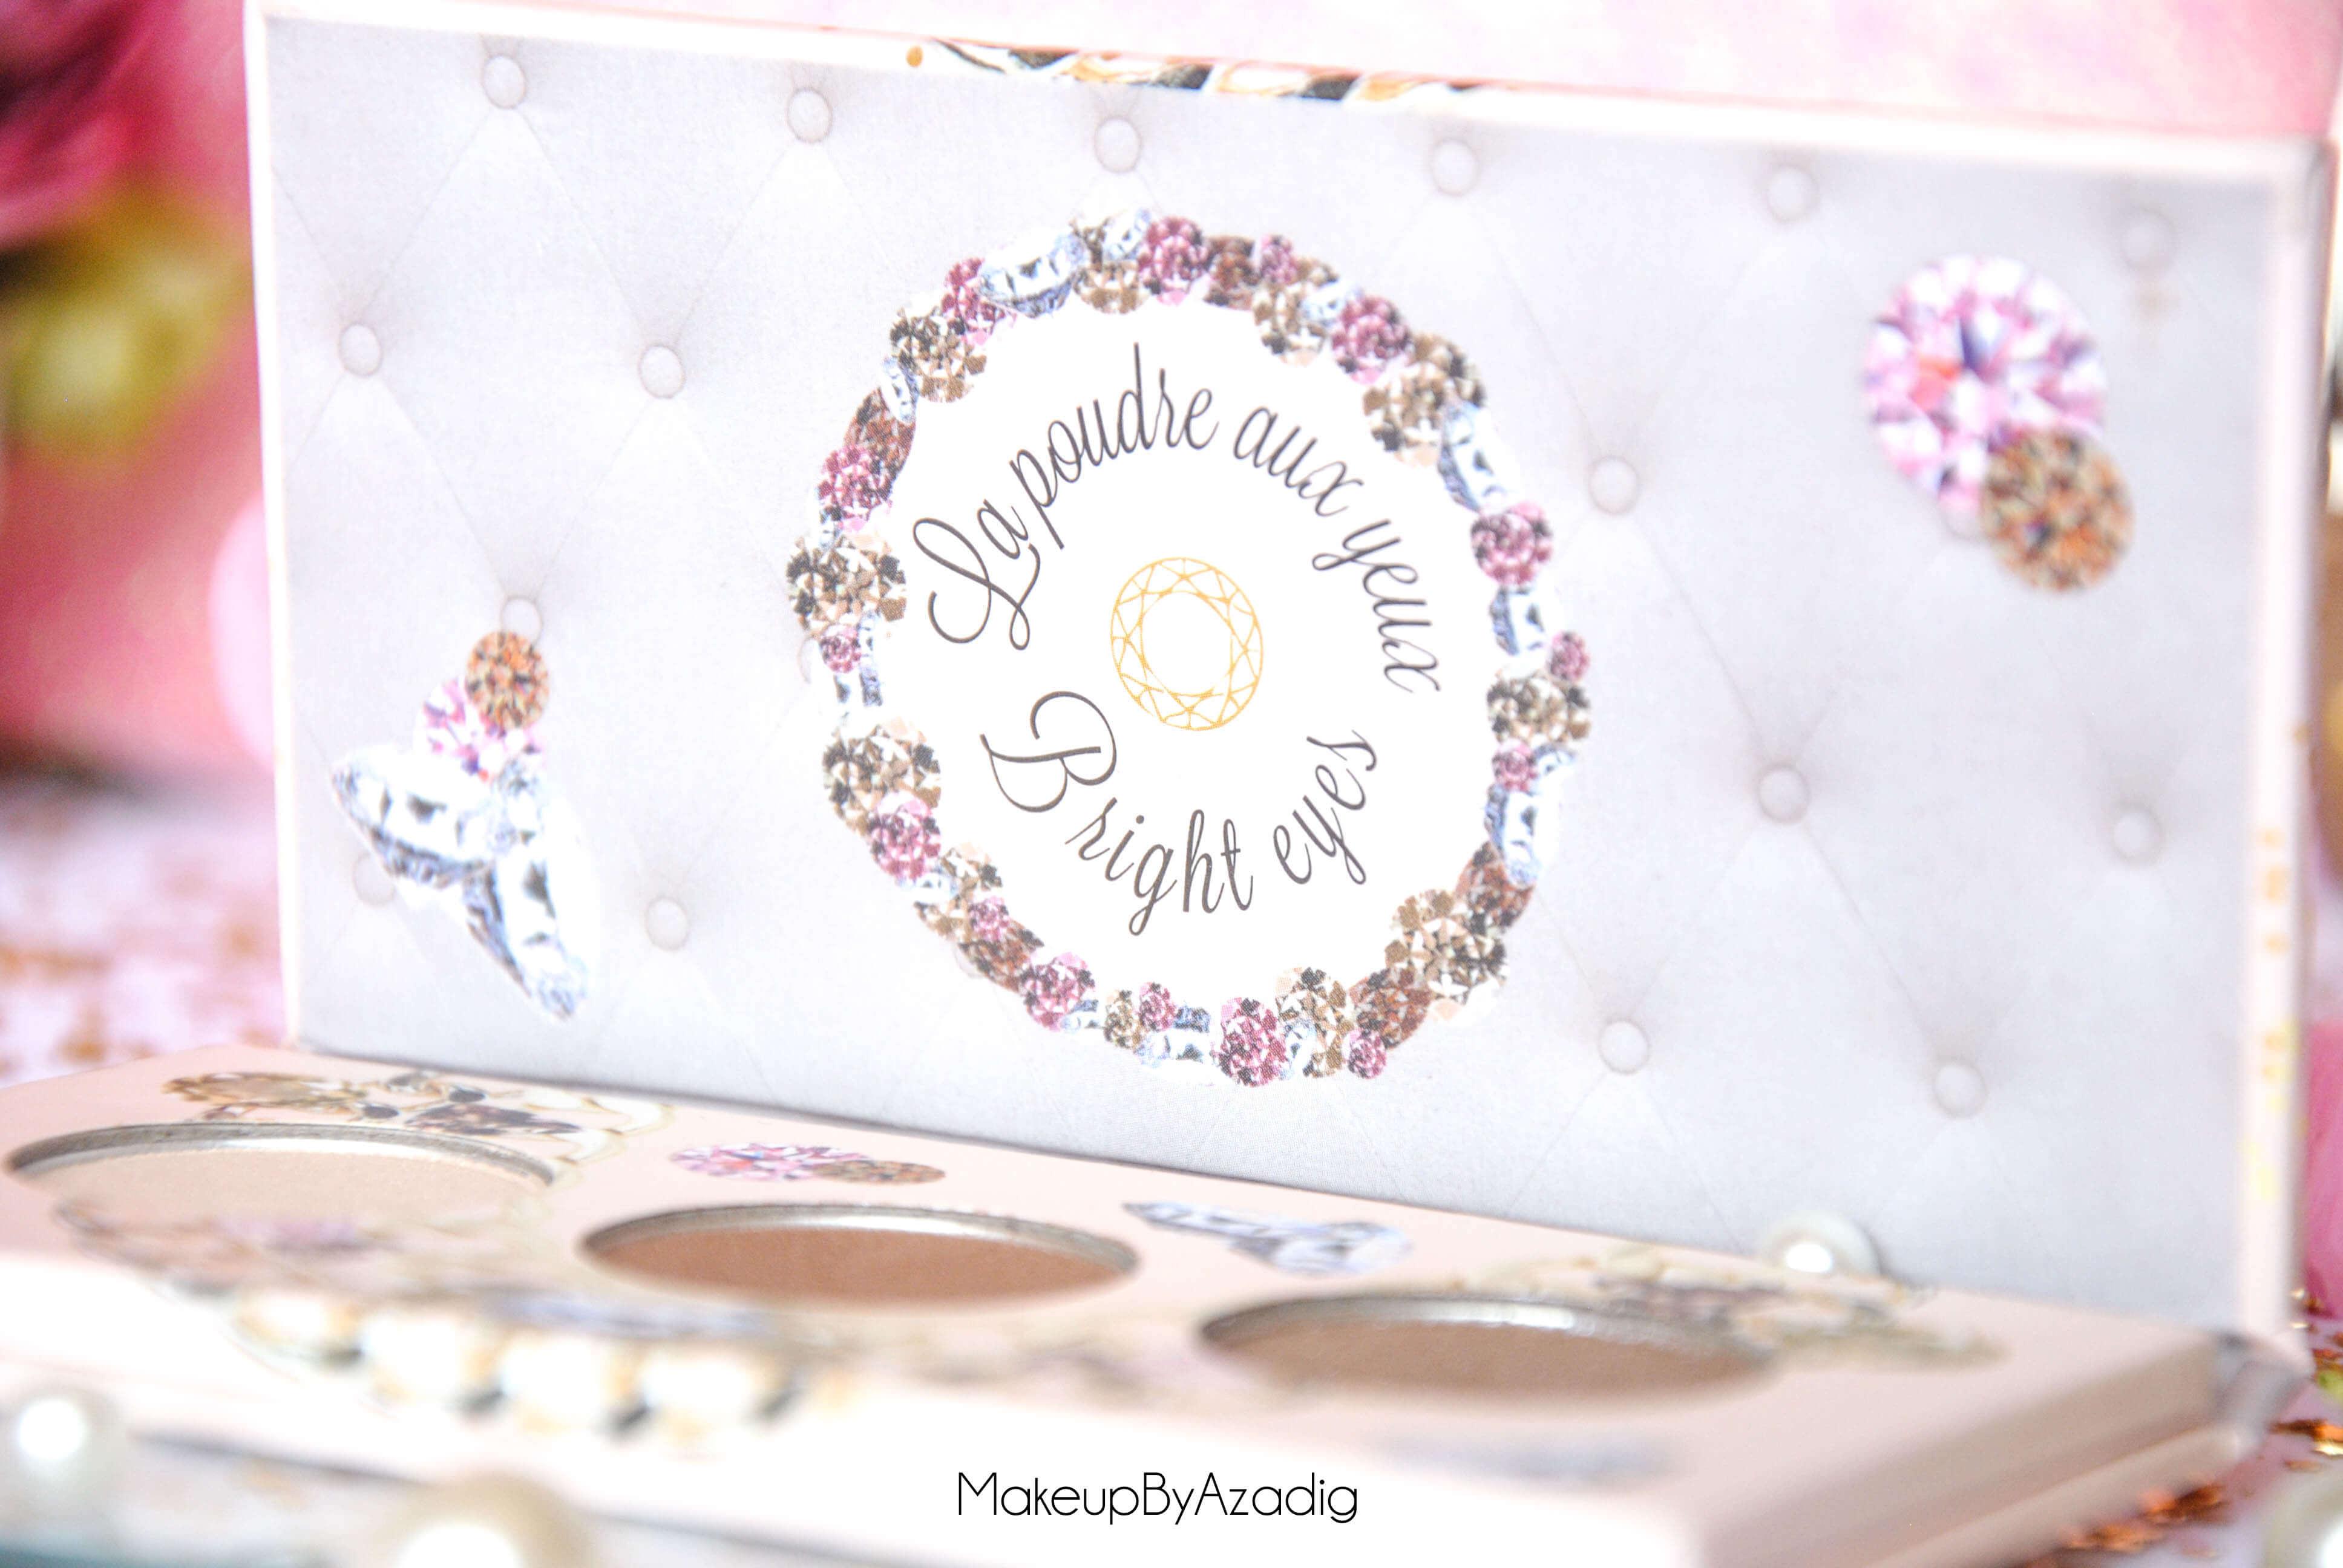 makeupbyazadig-palette-fards-paupieres-lollipops-paris-precieuse-monoprix-sephora-troyes-blog-revue-bright-eyes